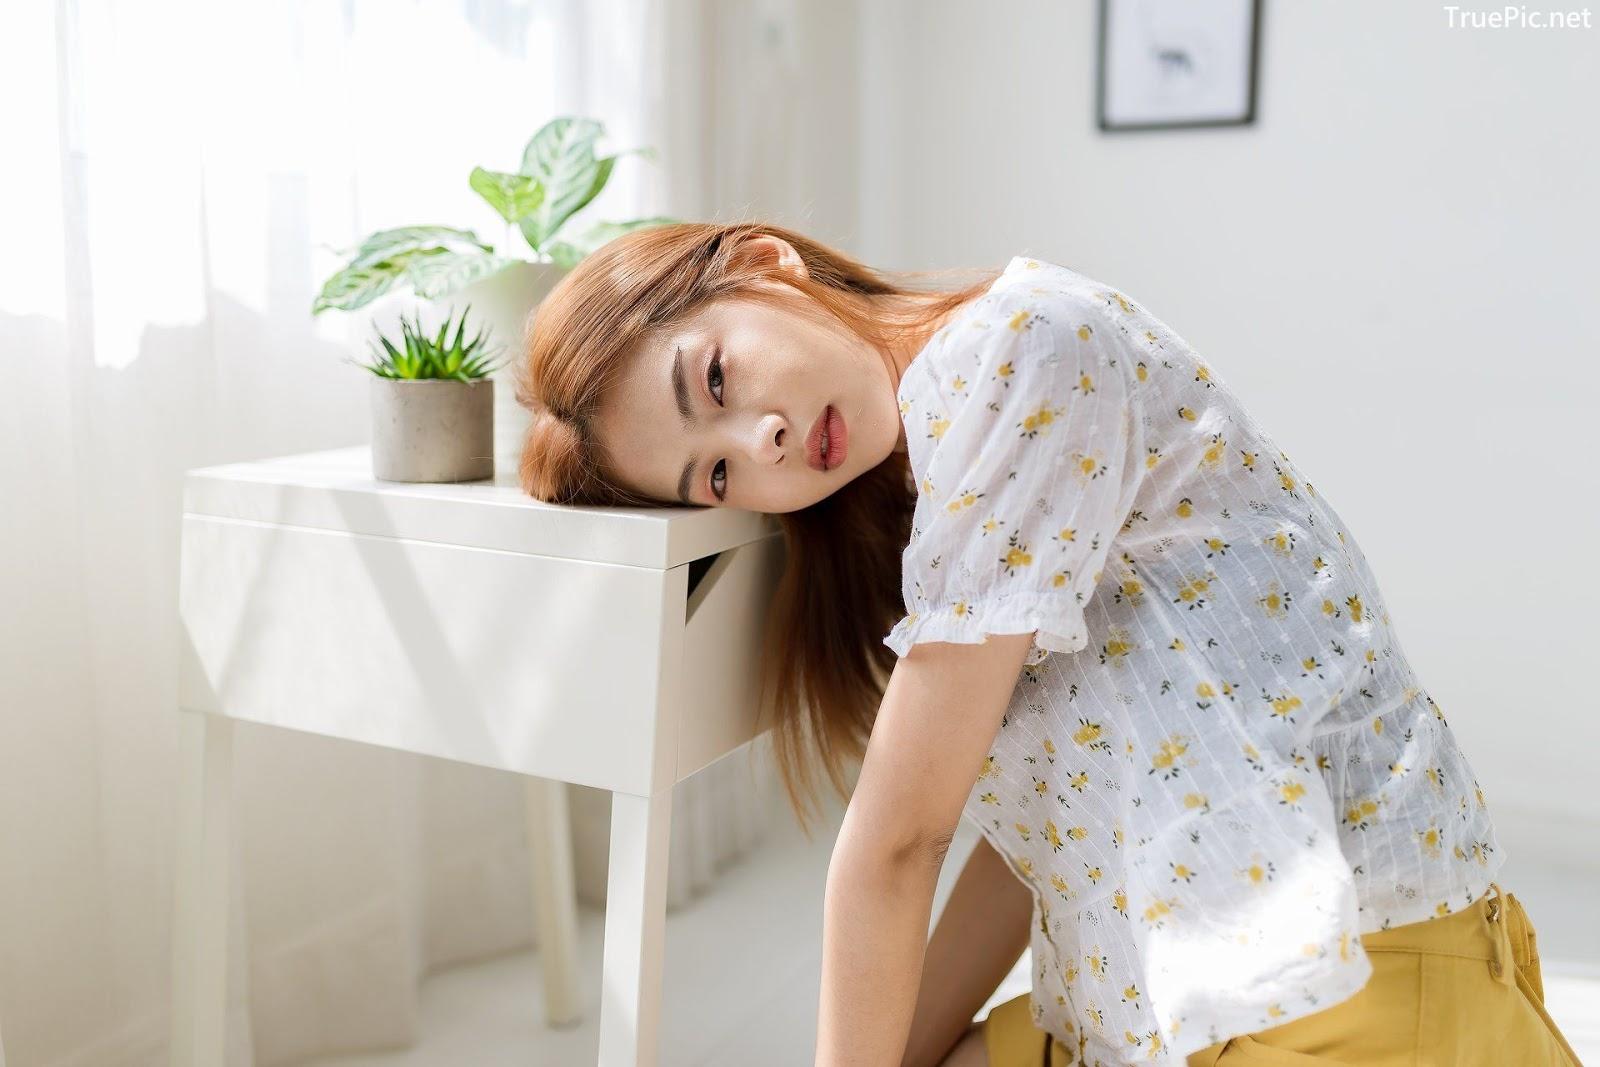 Image-Thailand-Angel-Model-Nut-Theerarat-White-Room-TruePic.net- Picture-1